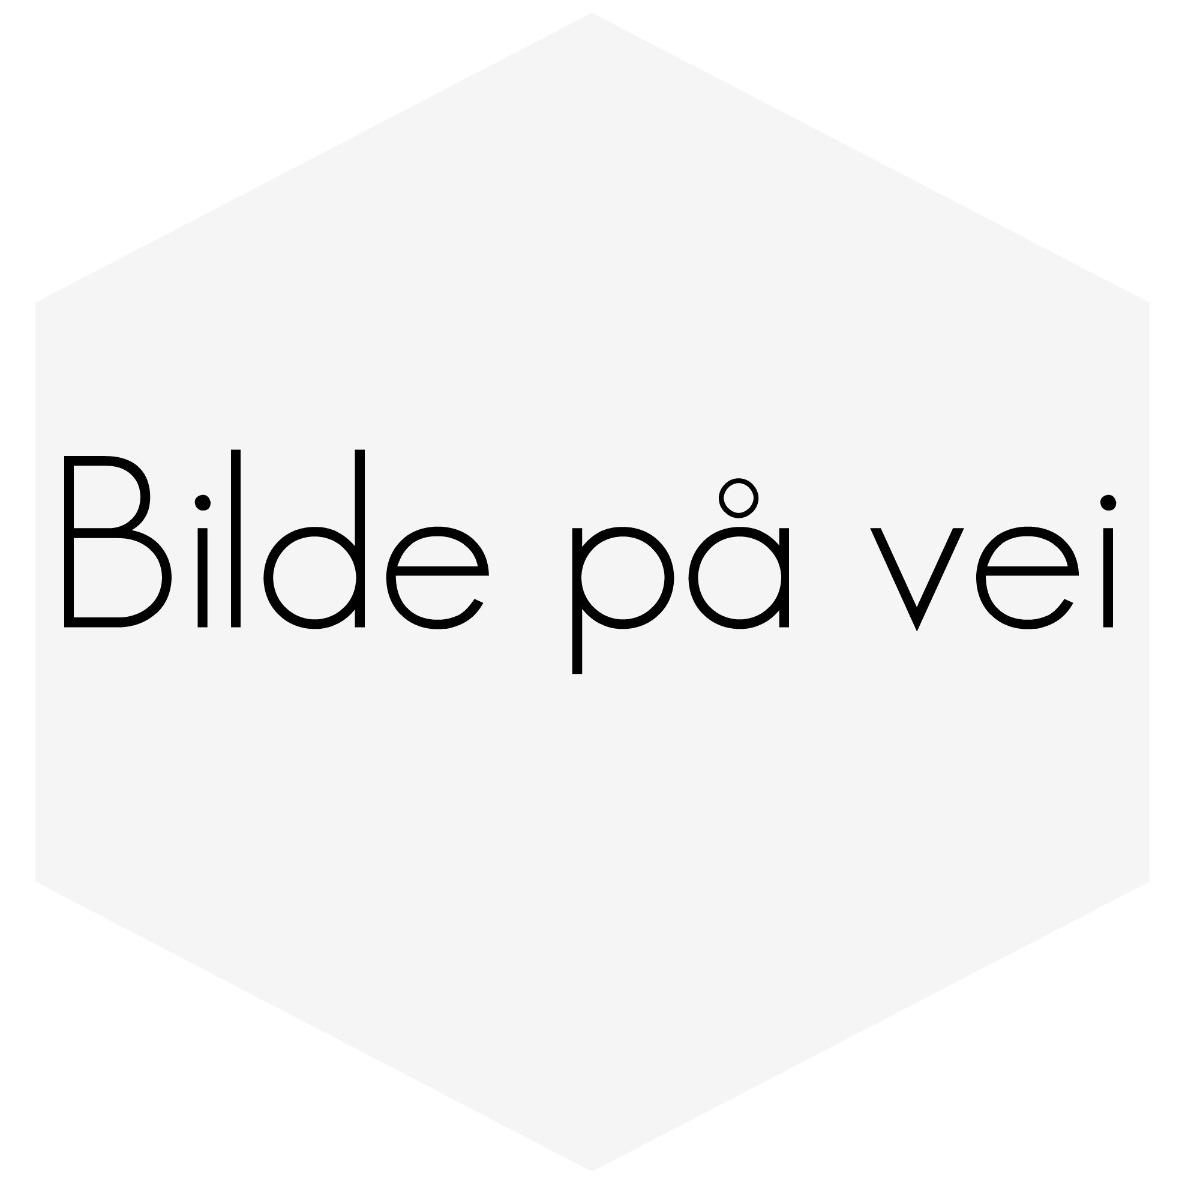 MONTERINGSRAMME FOR 1DIN/2DIN SPILLER TIL VOLVO SE INFO